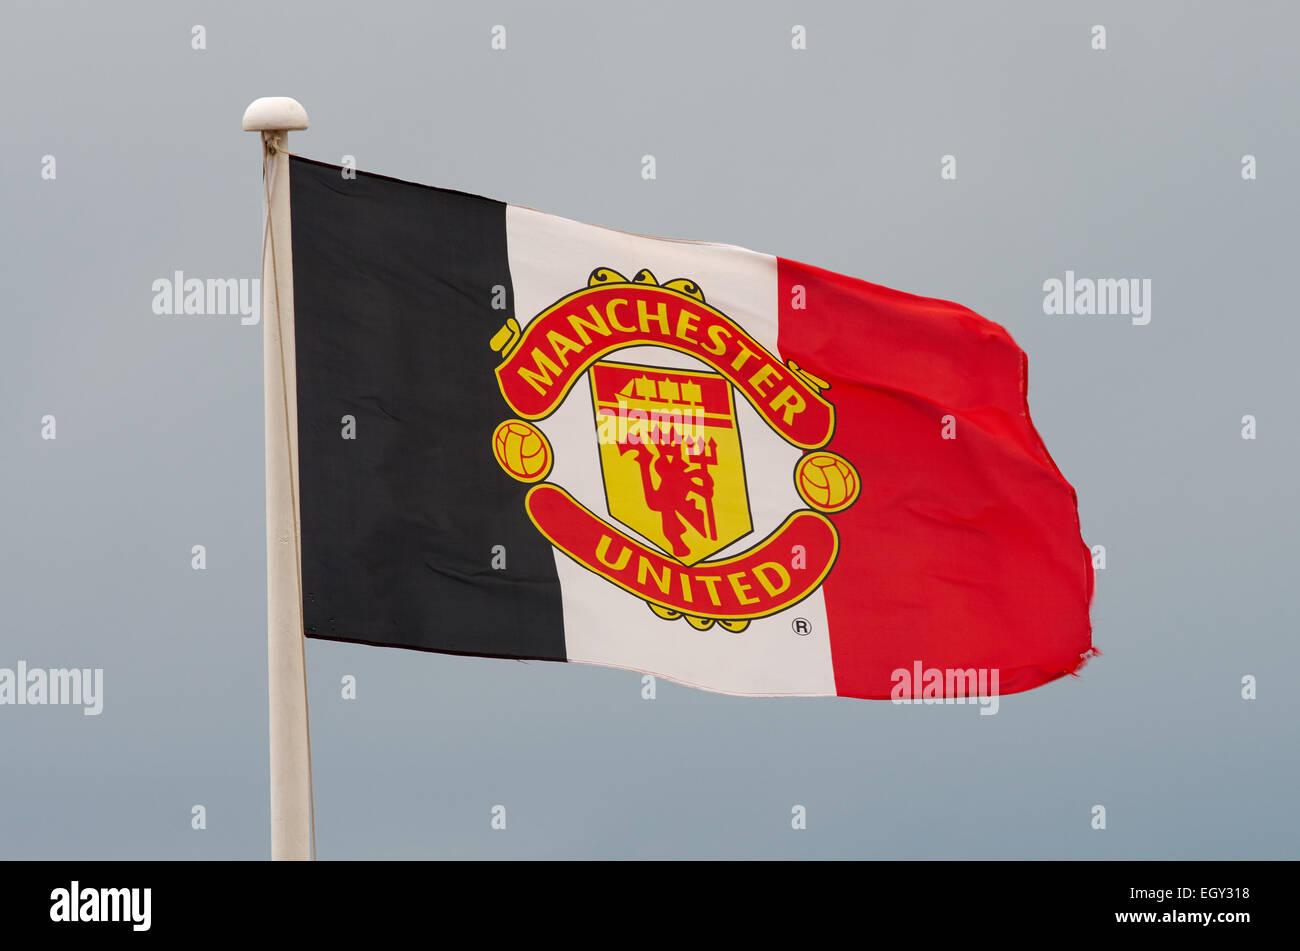 Manchester United supporter flag - Stock Image